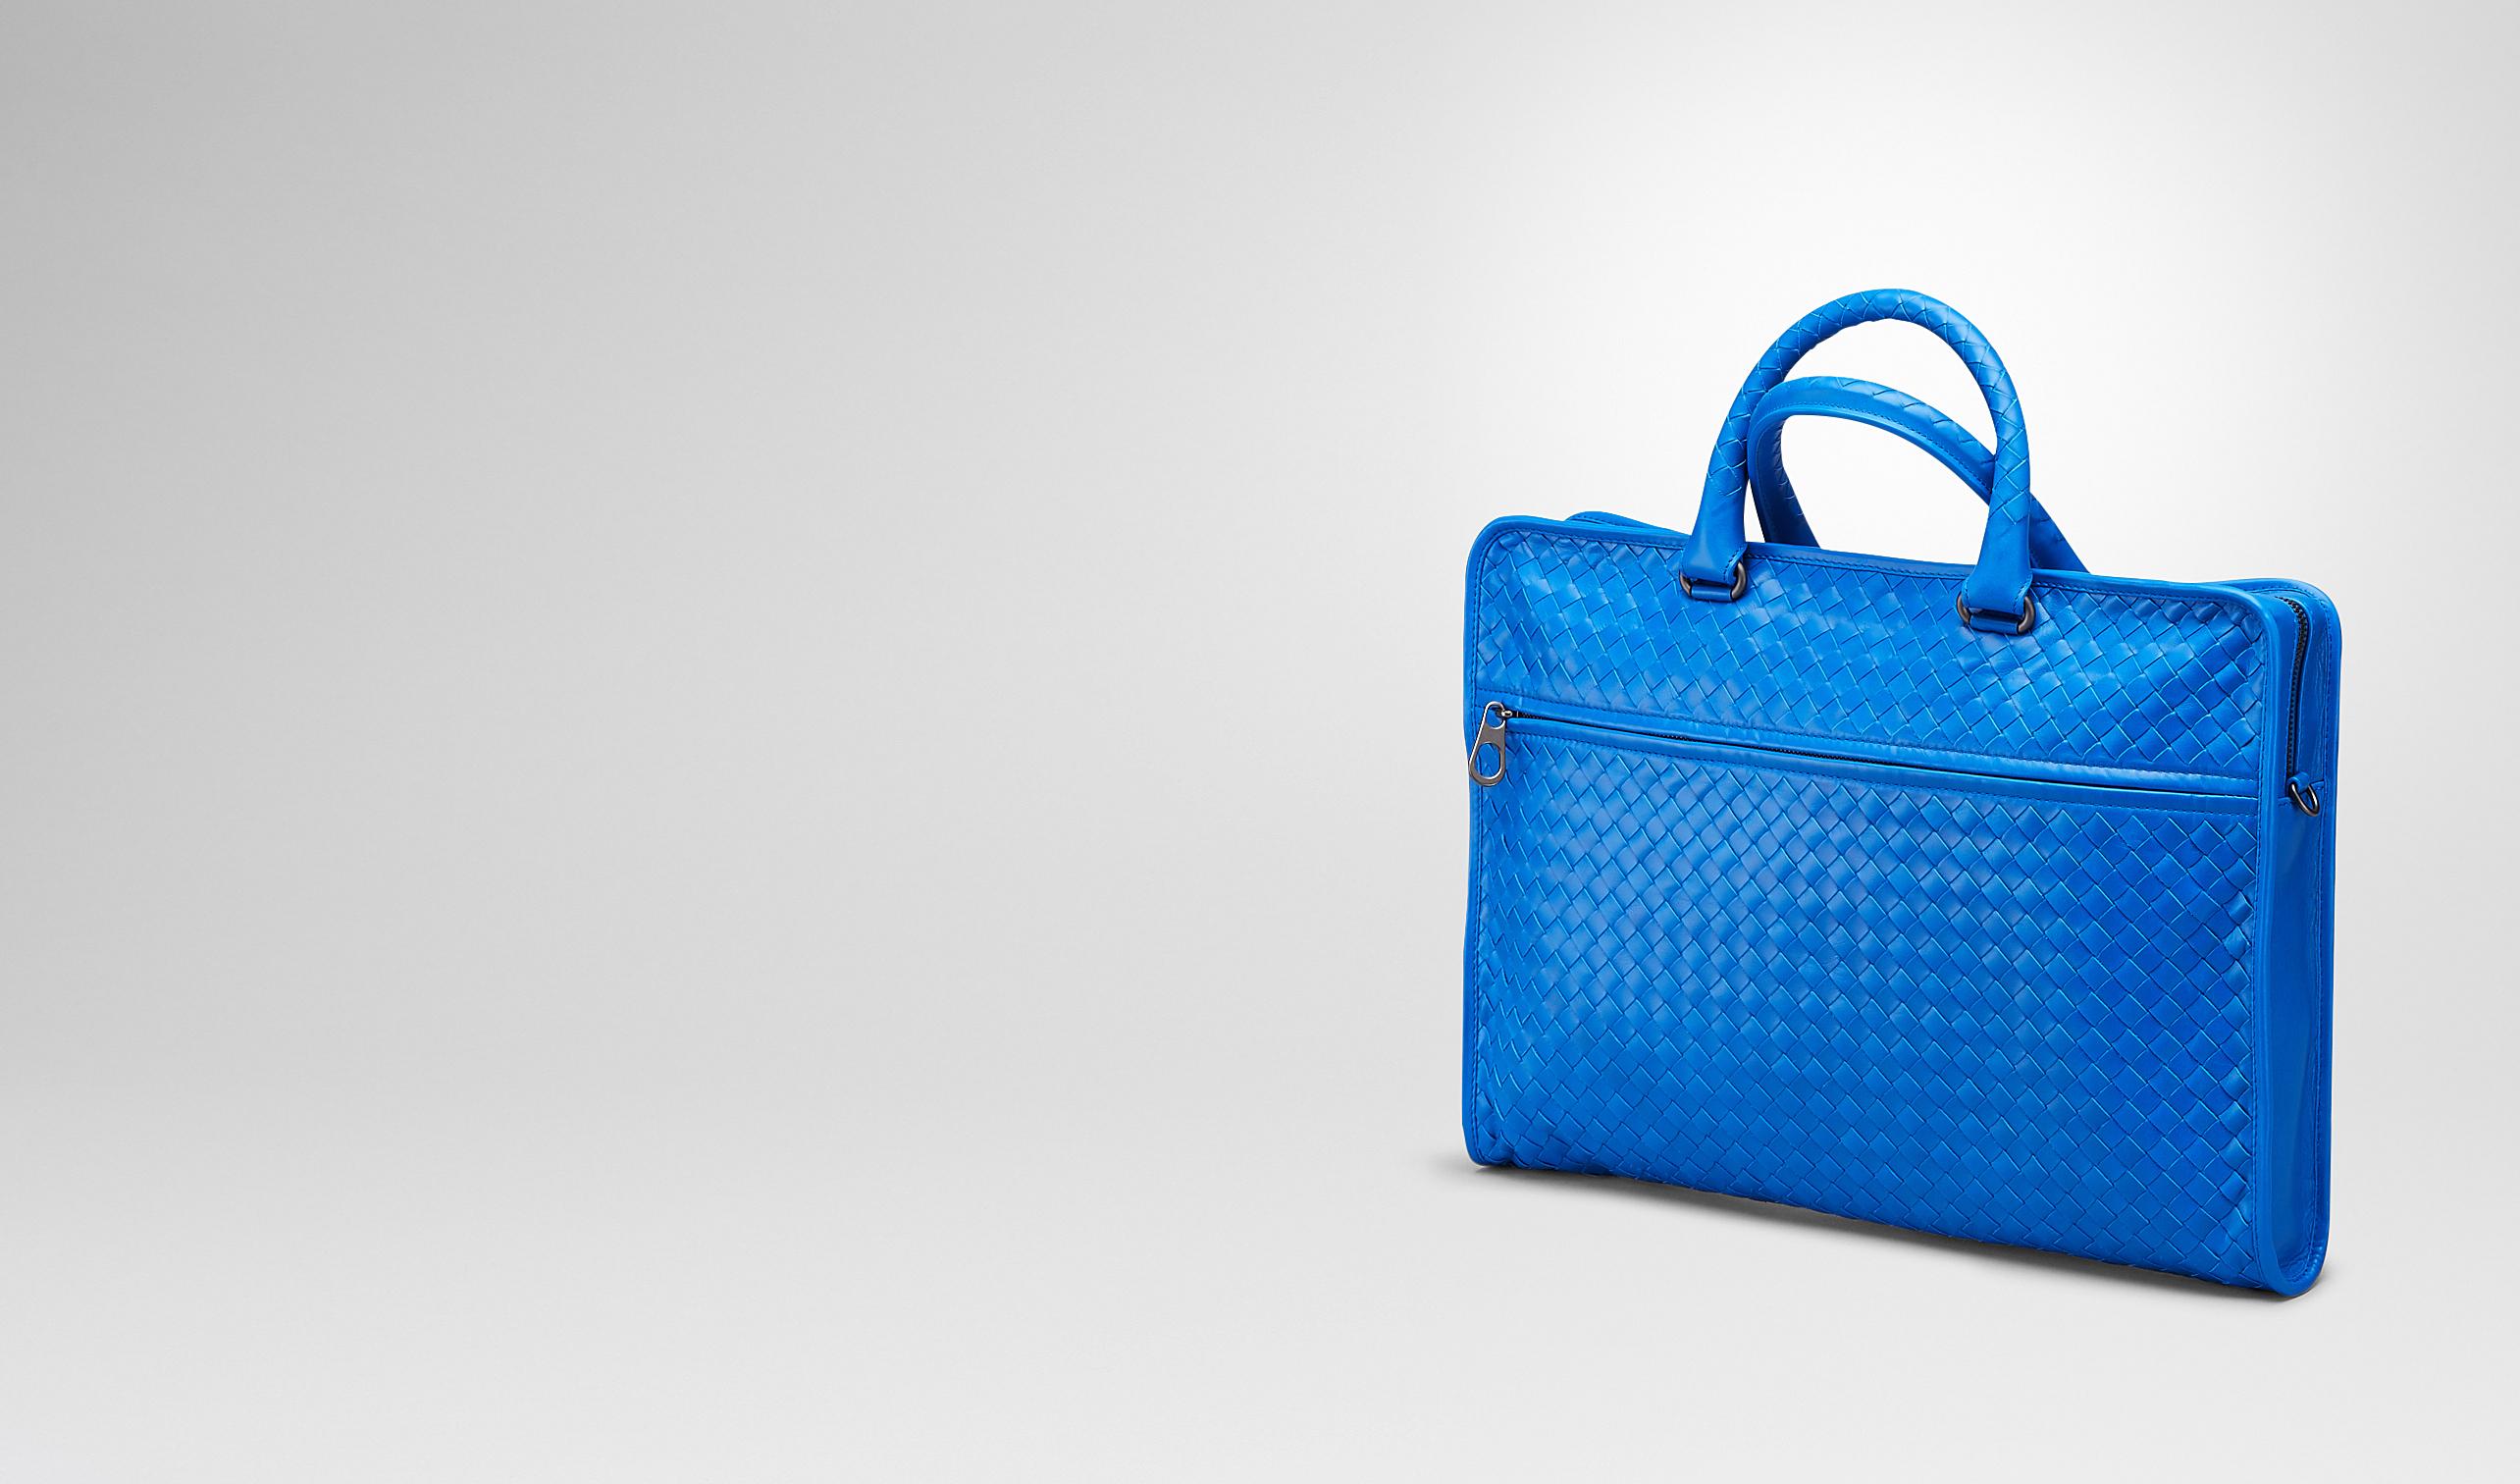 BOTTEGA VENETA Business Tasche U AKTENTASCHE AUS LEICHTEM KALBSLEDER INTRECCIATO SIGNAL BLUE pl